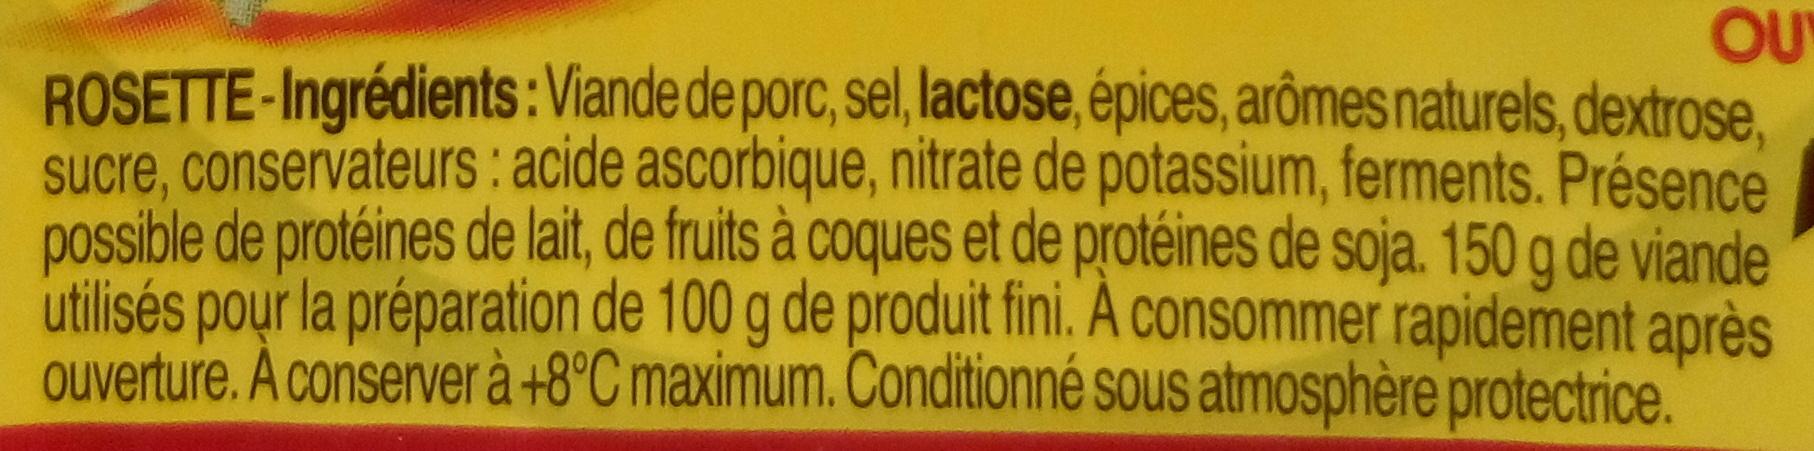 Les p'tites tranches Rosette - Ingrediënten - fr